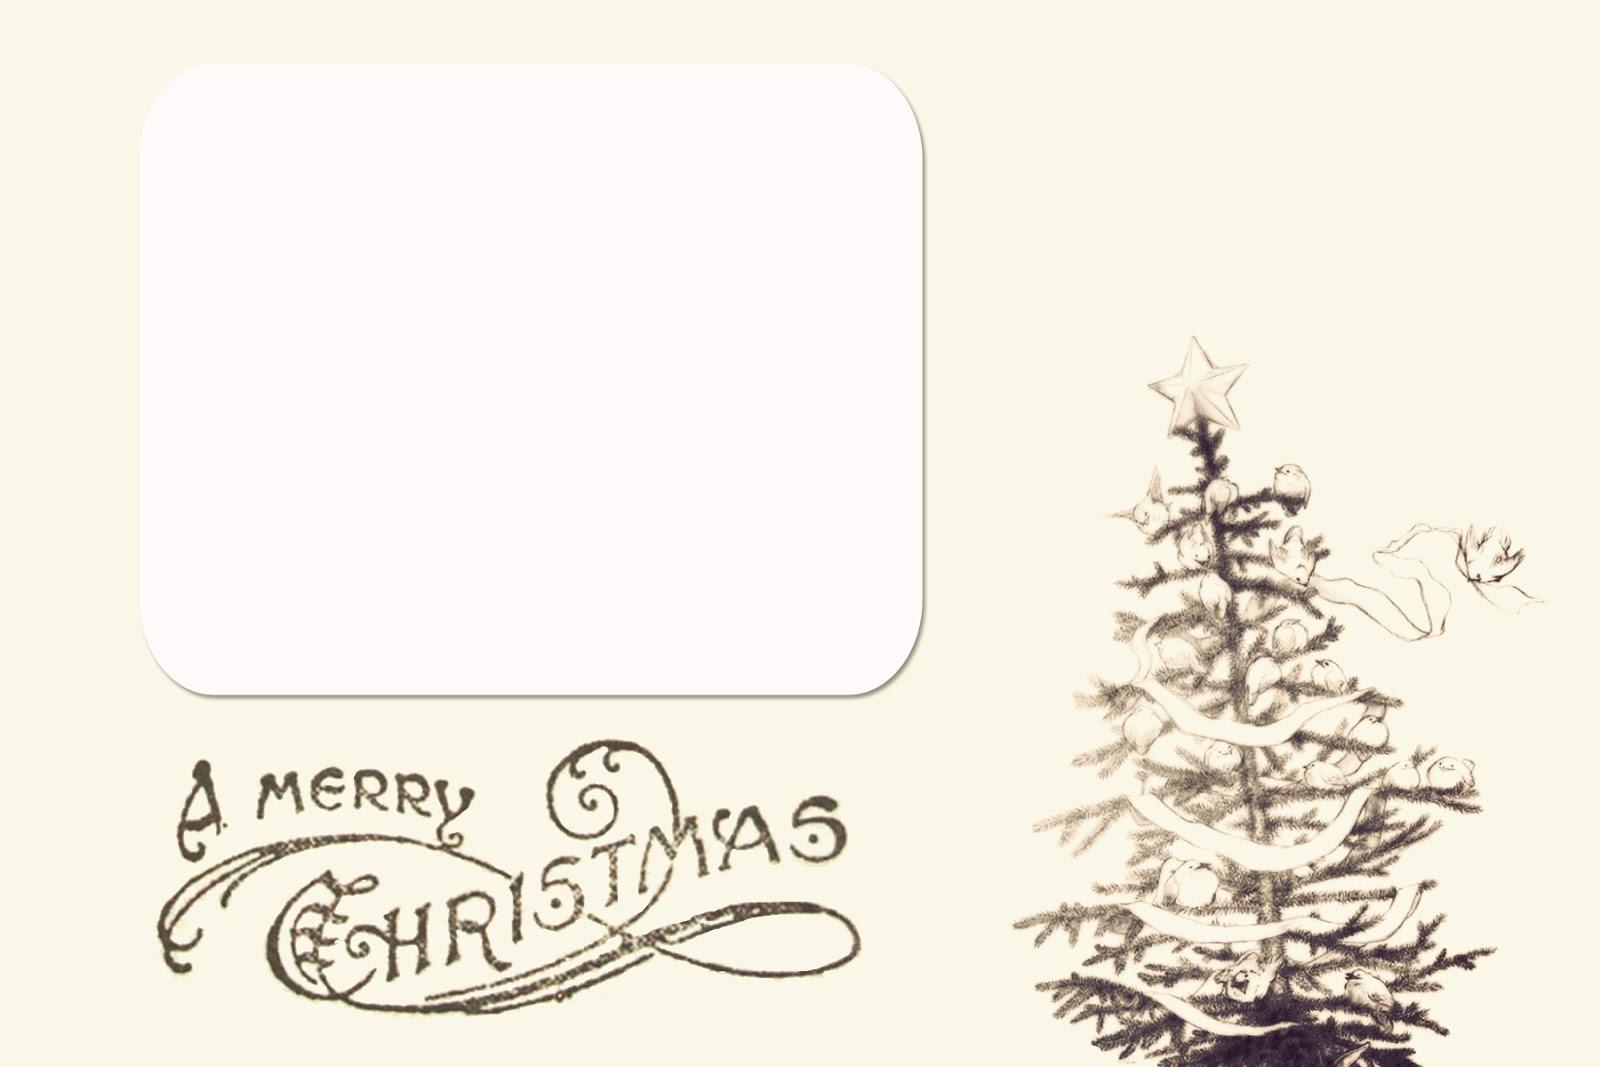 004 Free Christmas Card Templates Template Ideas Wonderful Printable - Free Printable Xmas Cards Online